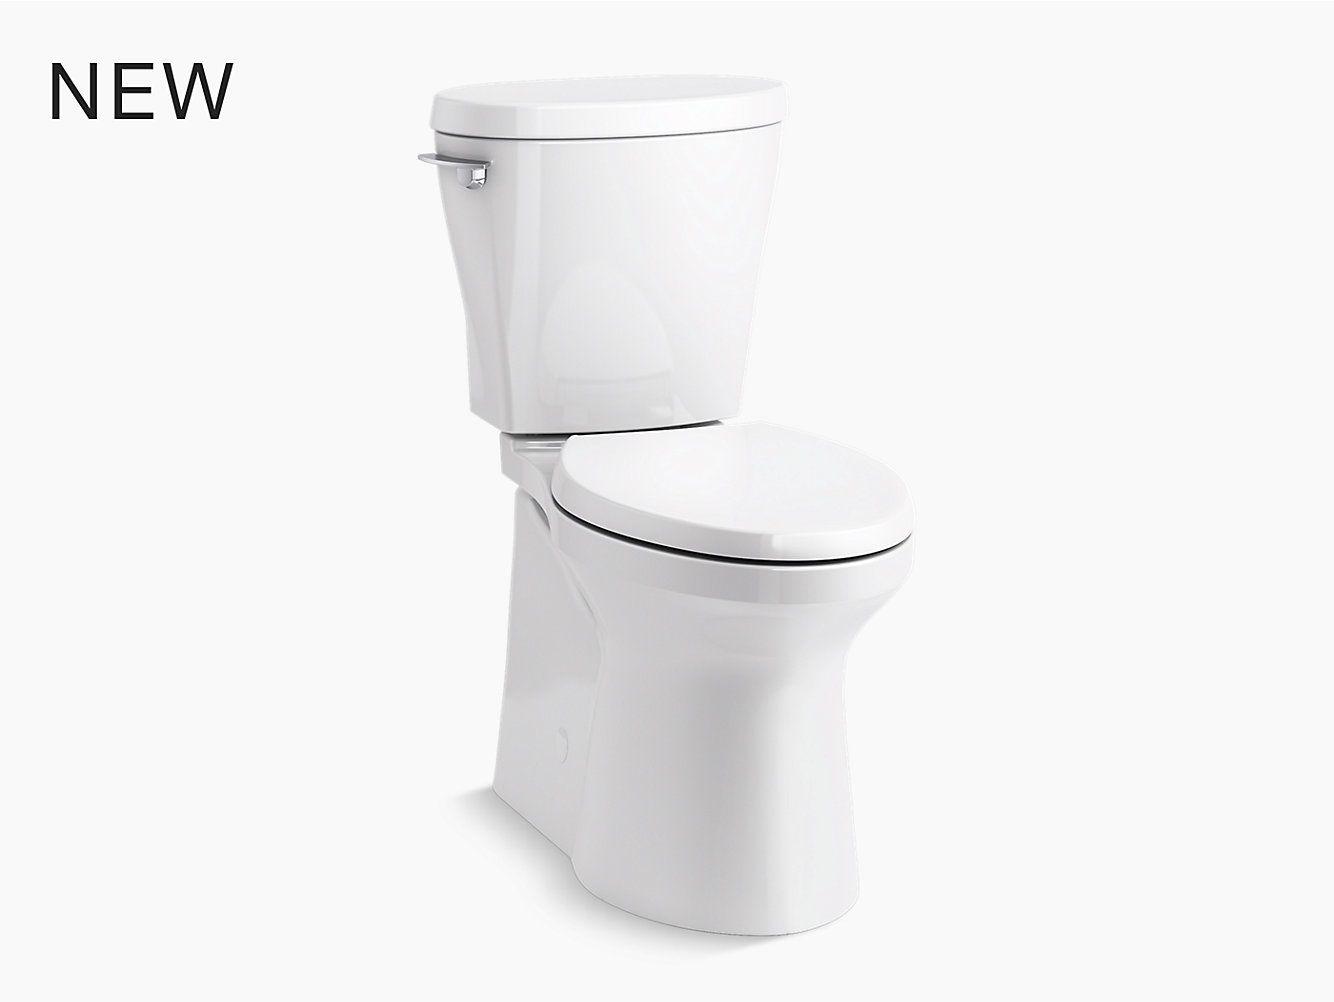 Betello Comfort Height Chair Height Skirted Toilet 1 28 Gpf K 20197 Kohler Kohler Toilet Kohler Toilet Bowl Cleaner